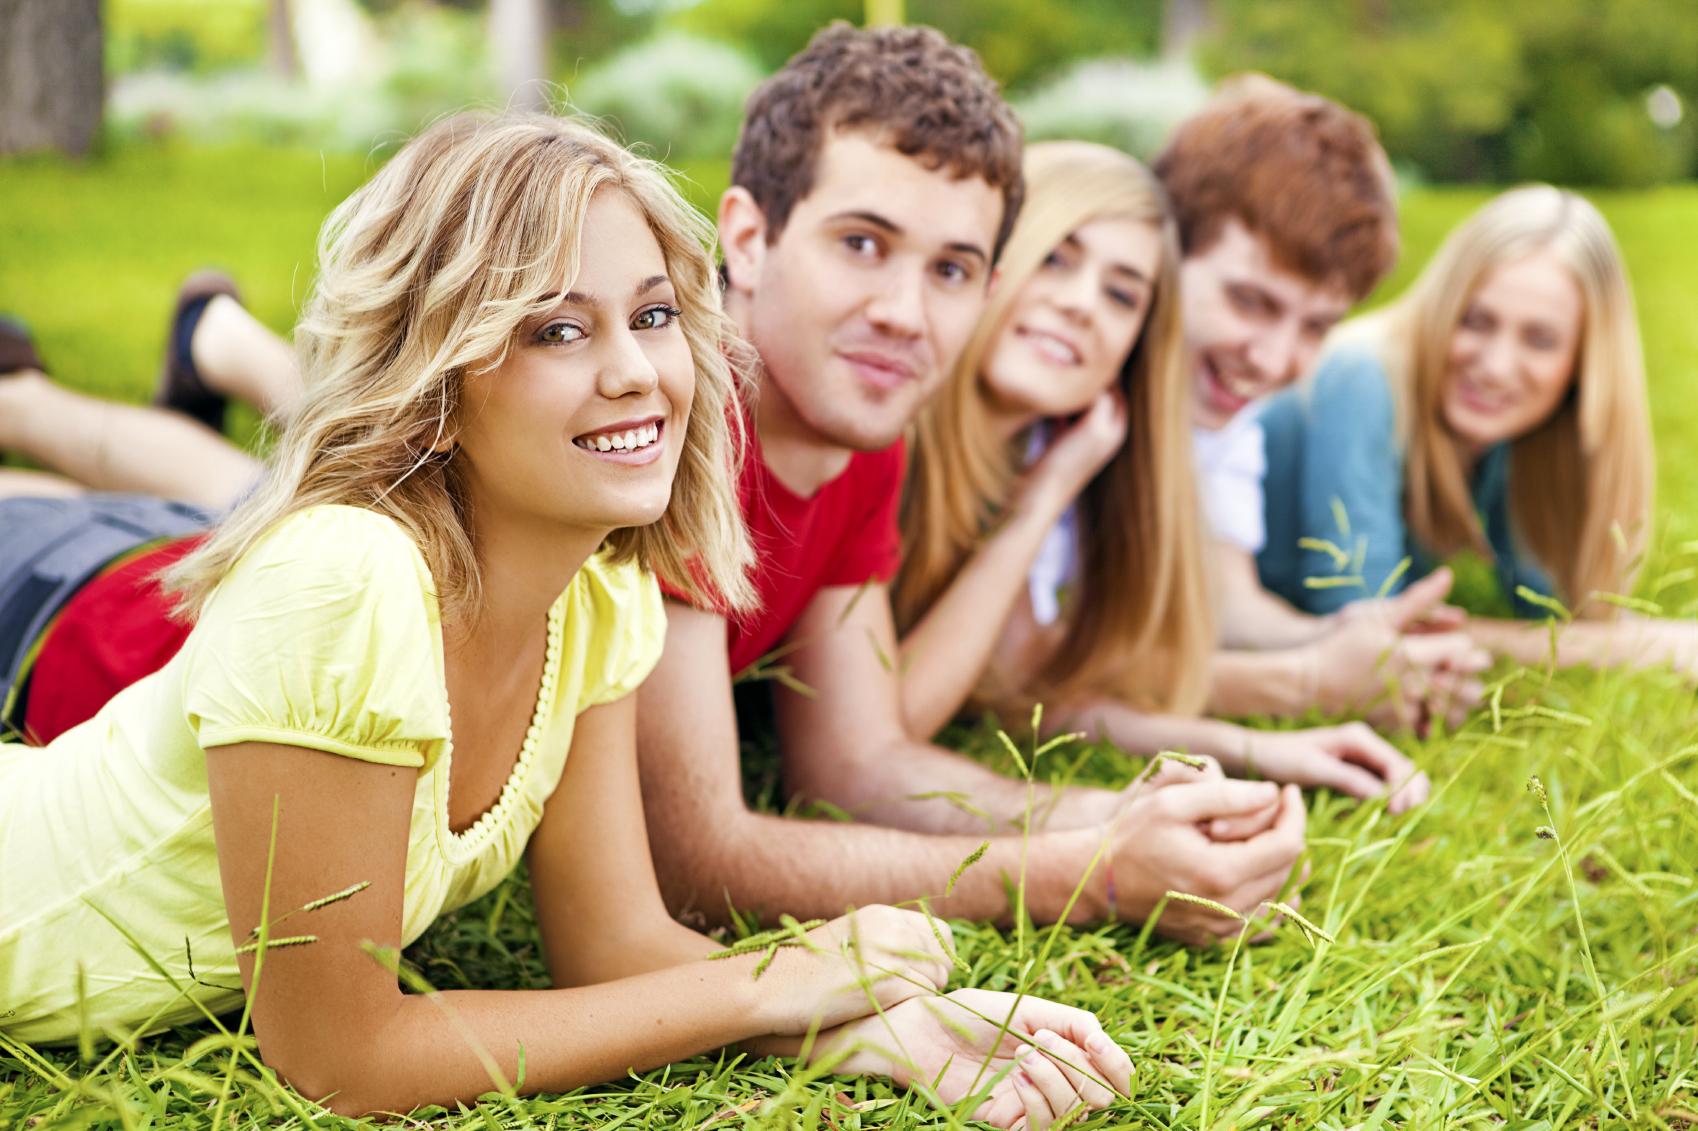 Adolescents